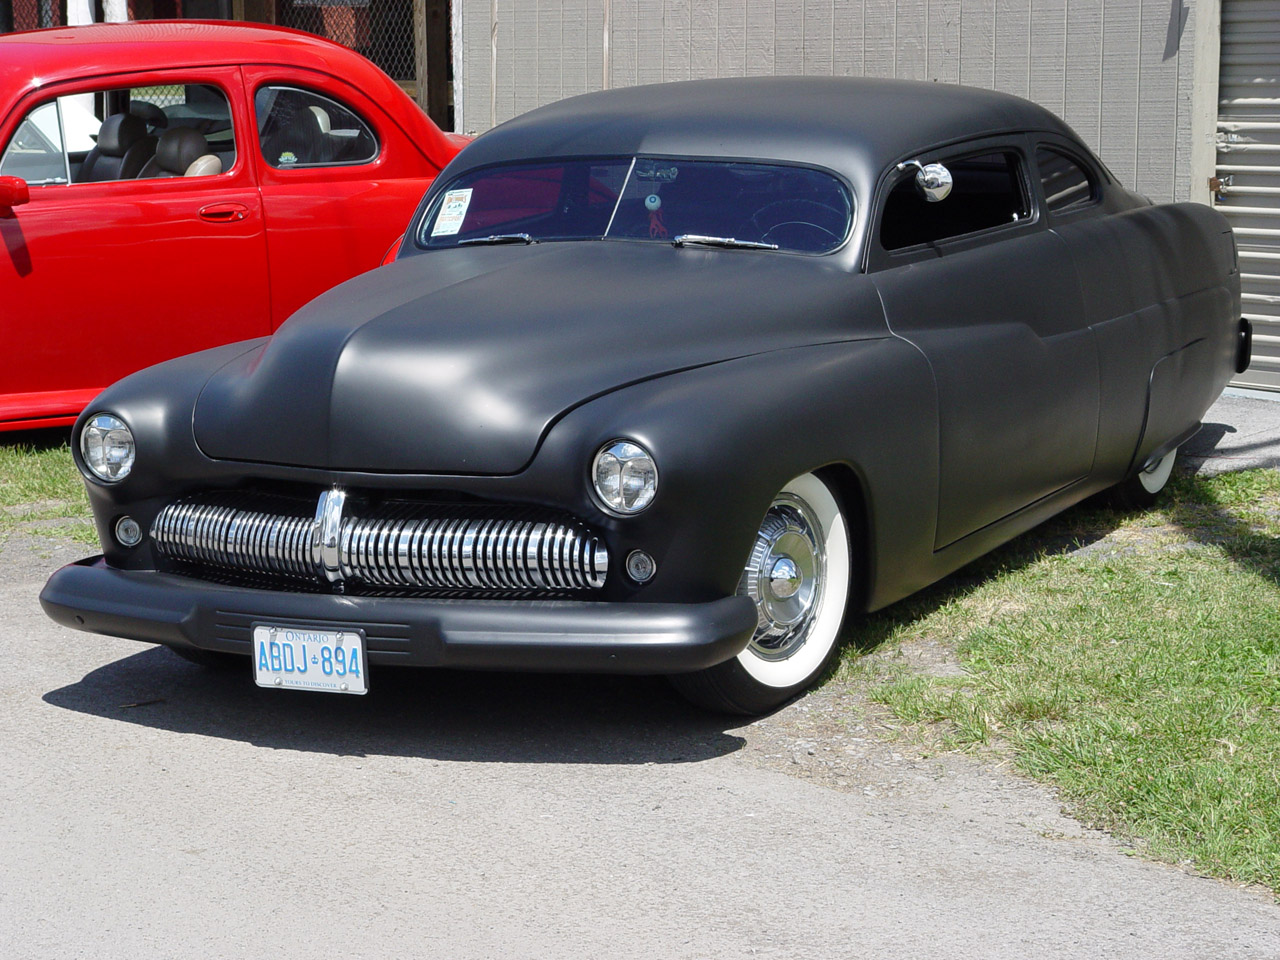 Lincoln Motor Company >> riseing-motor-classics - Ford Mercury